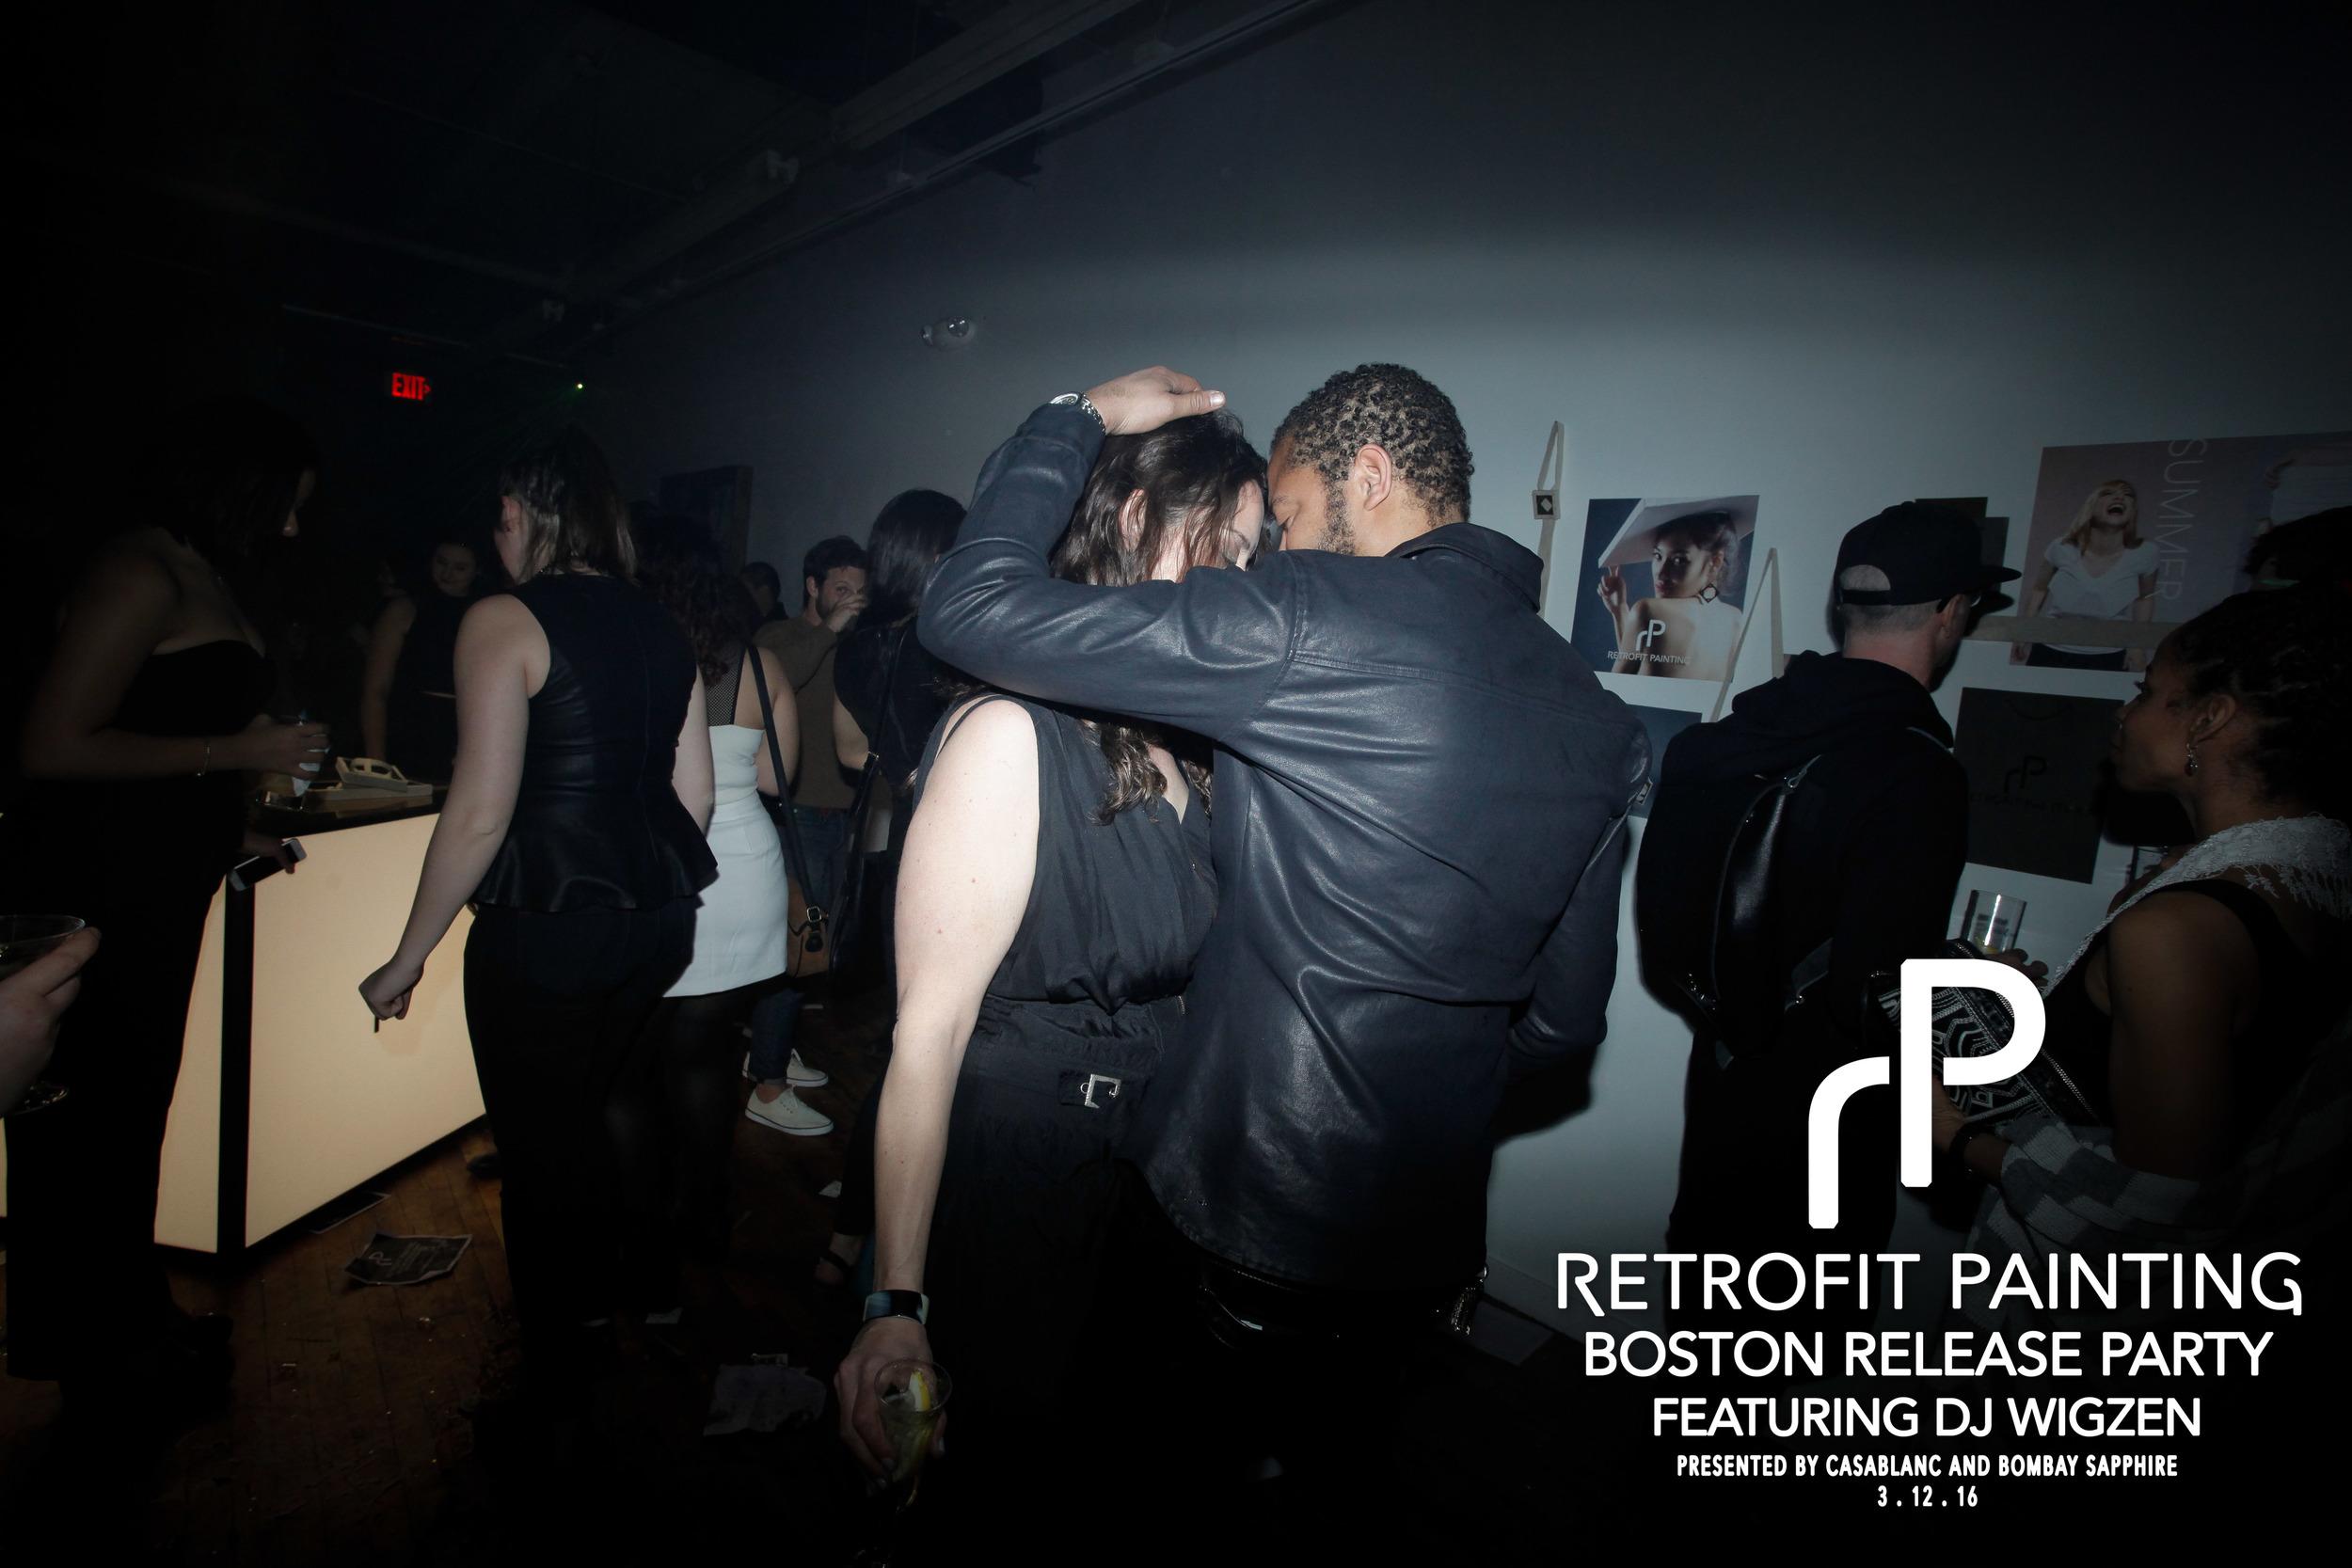 Retrofit Painting Boston Release Party 0156.jpg